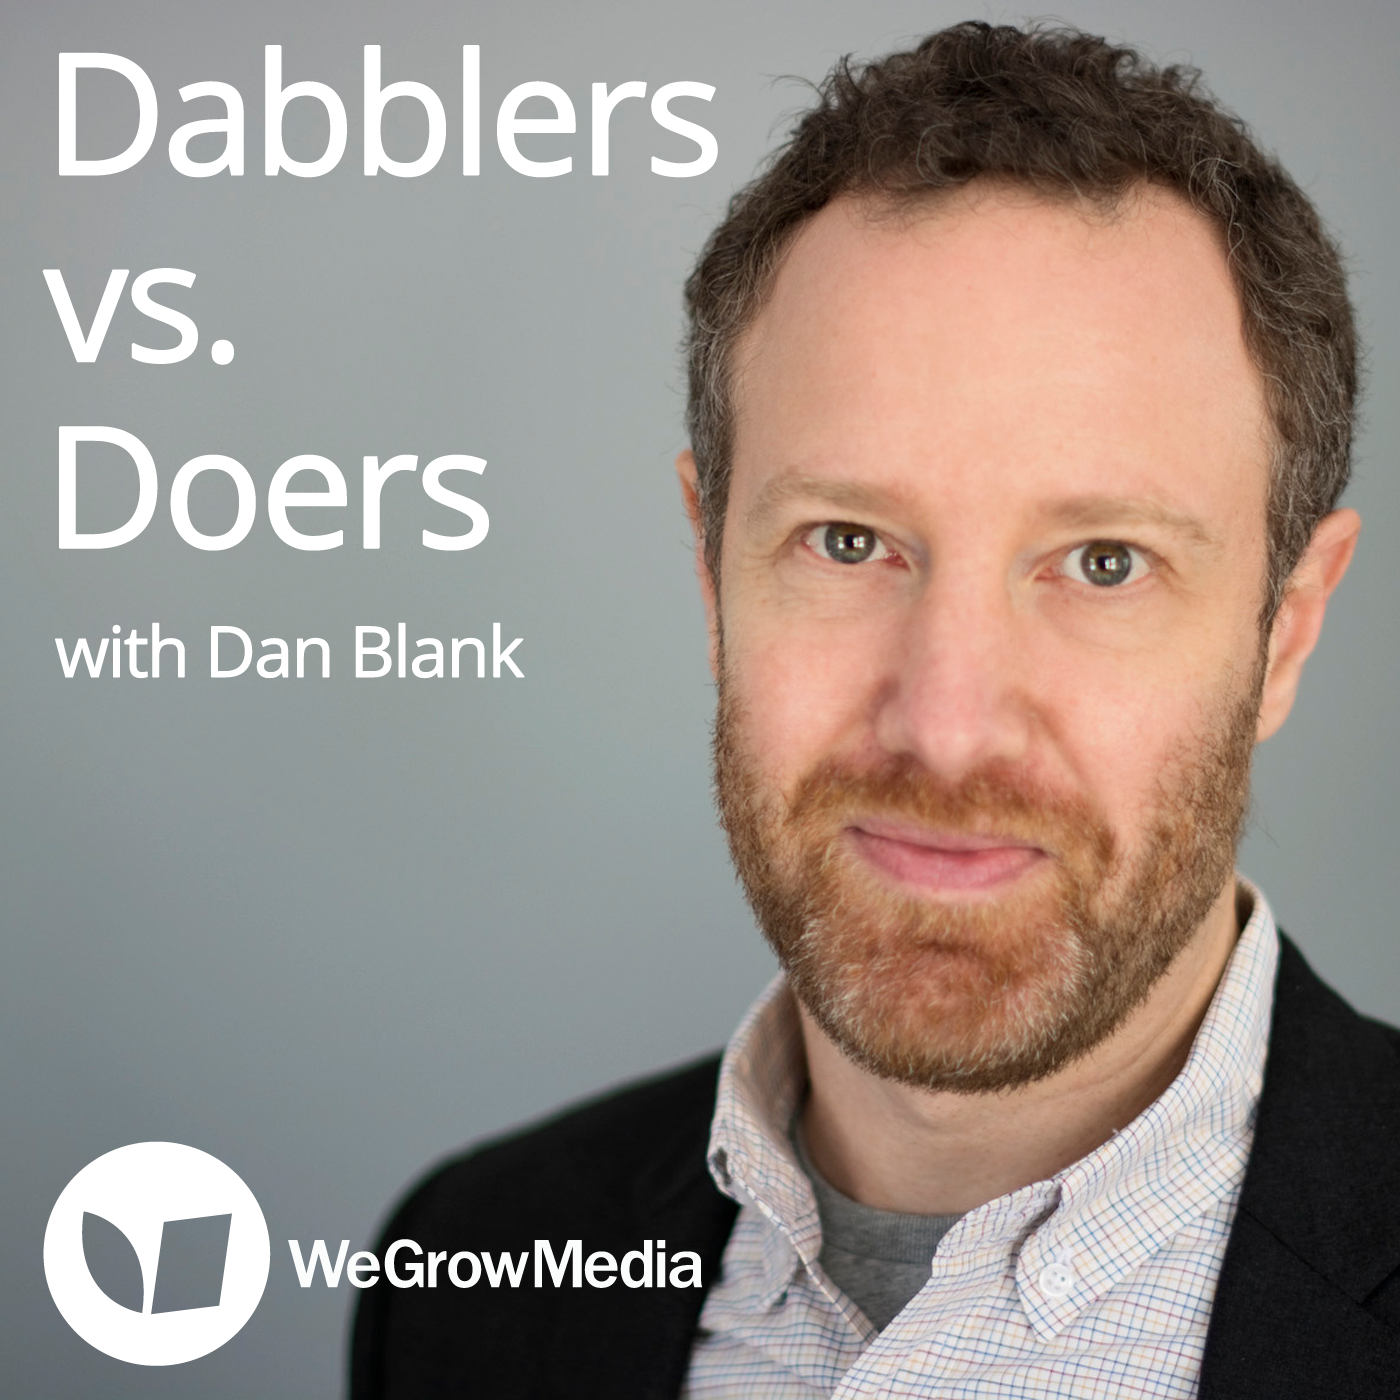 Dabblers vs. Doers - a WeGrowMedia podcast with Dan Blank